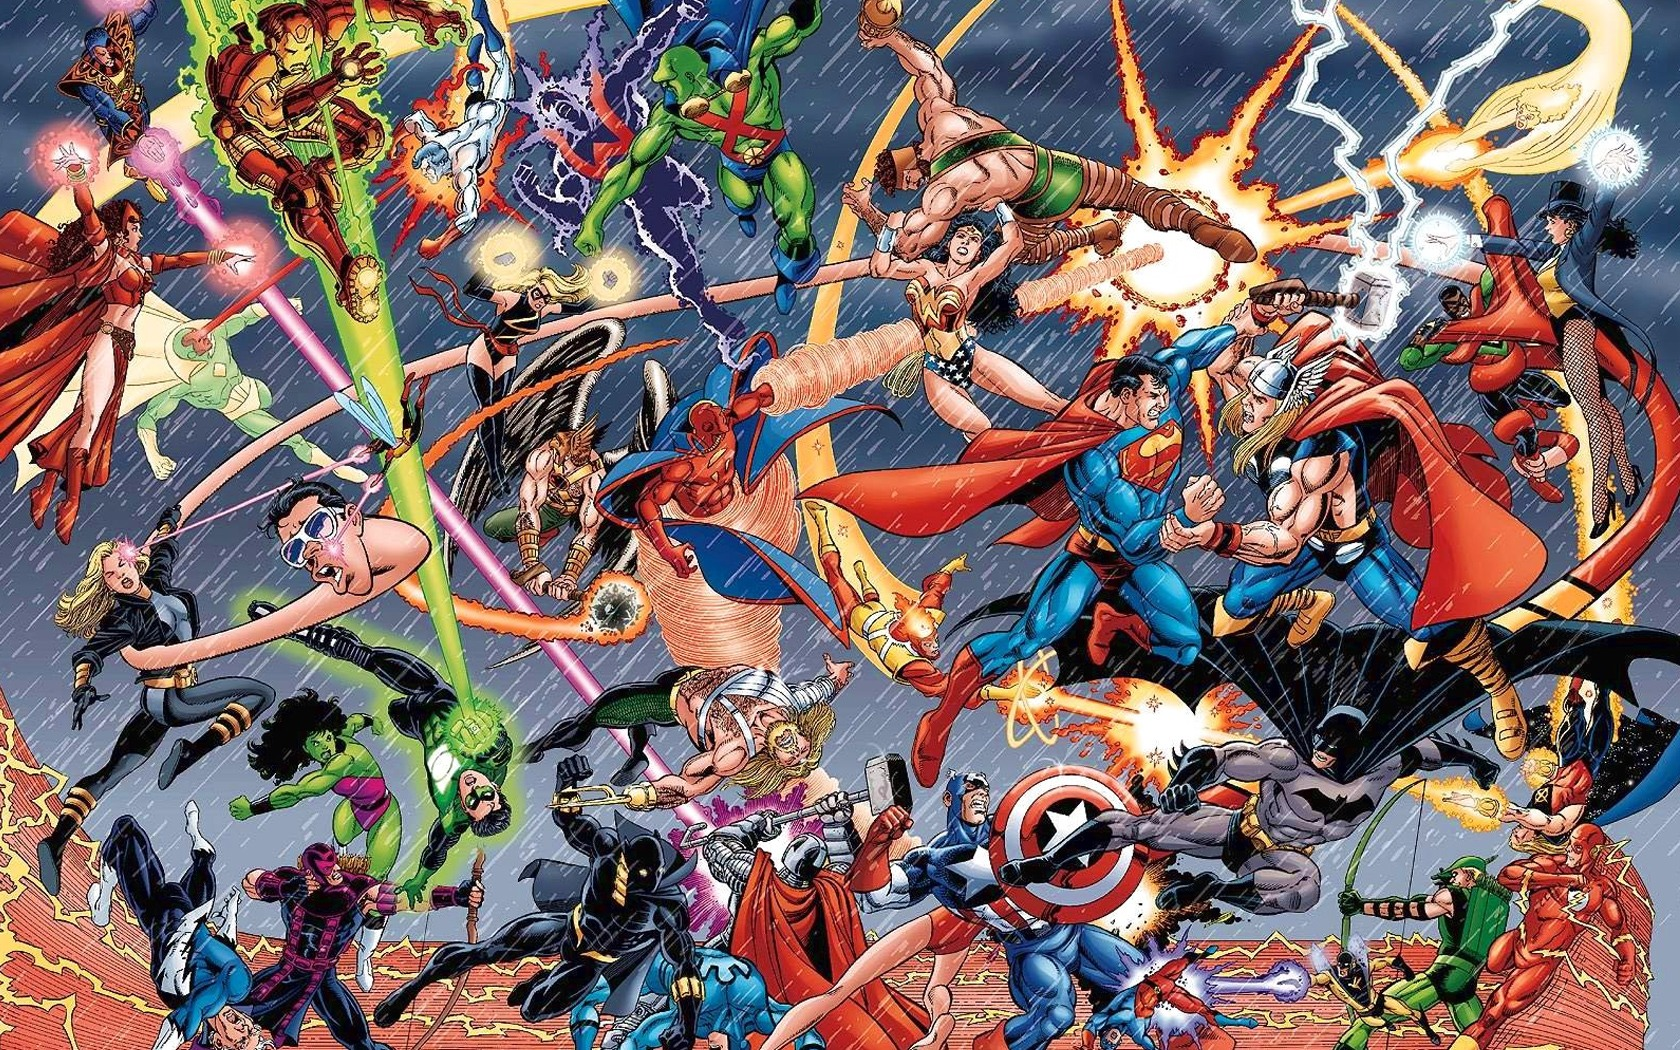 DC Vs Marvel Superhero Wallpapers Superhero Wallpapers HQ HD 1680x1050